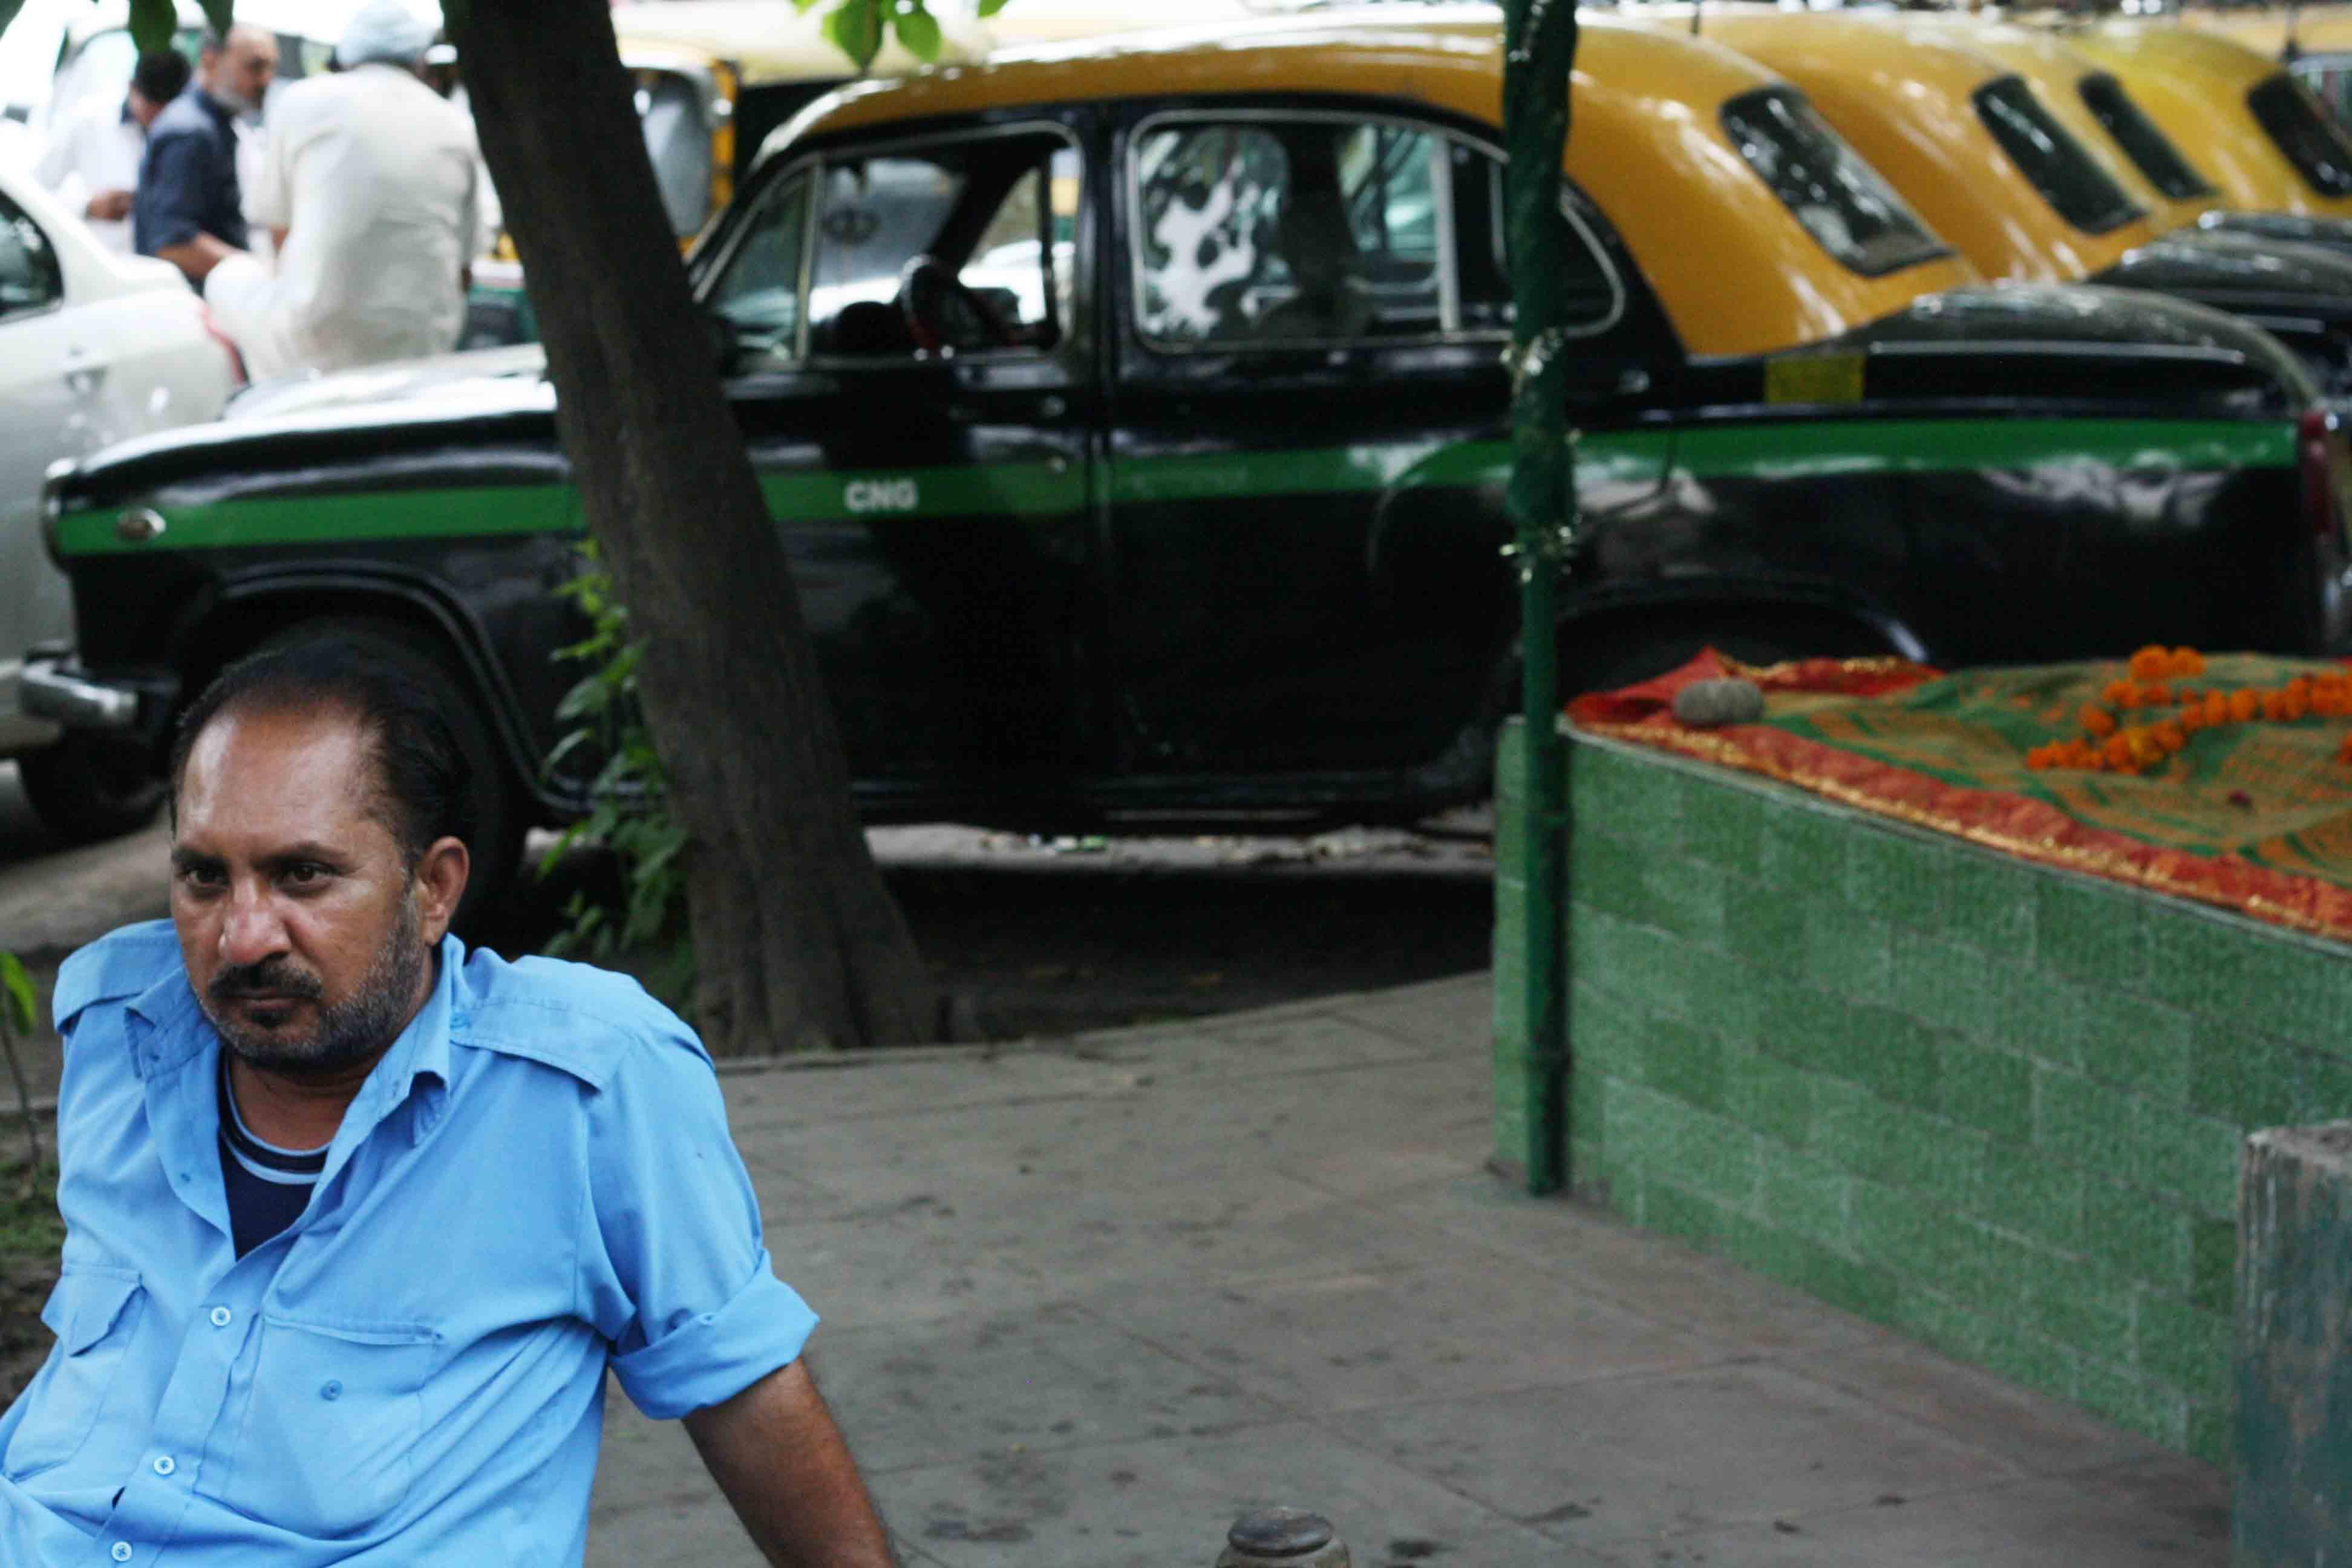 City Landmark - Taxi Stands, Around Town